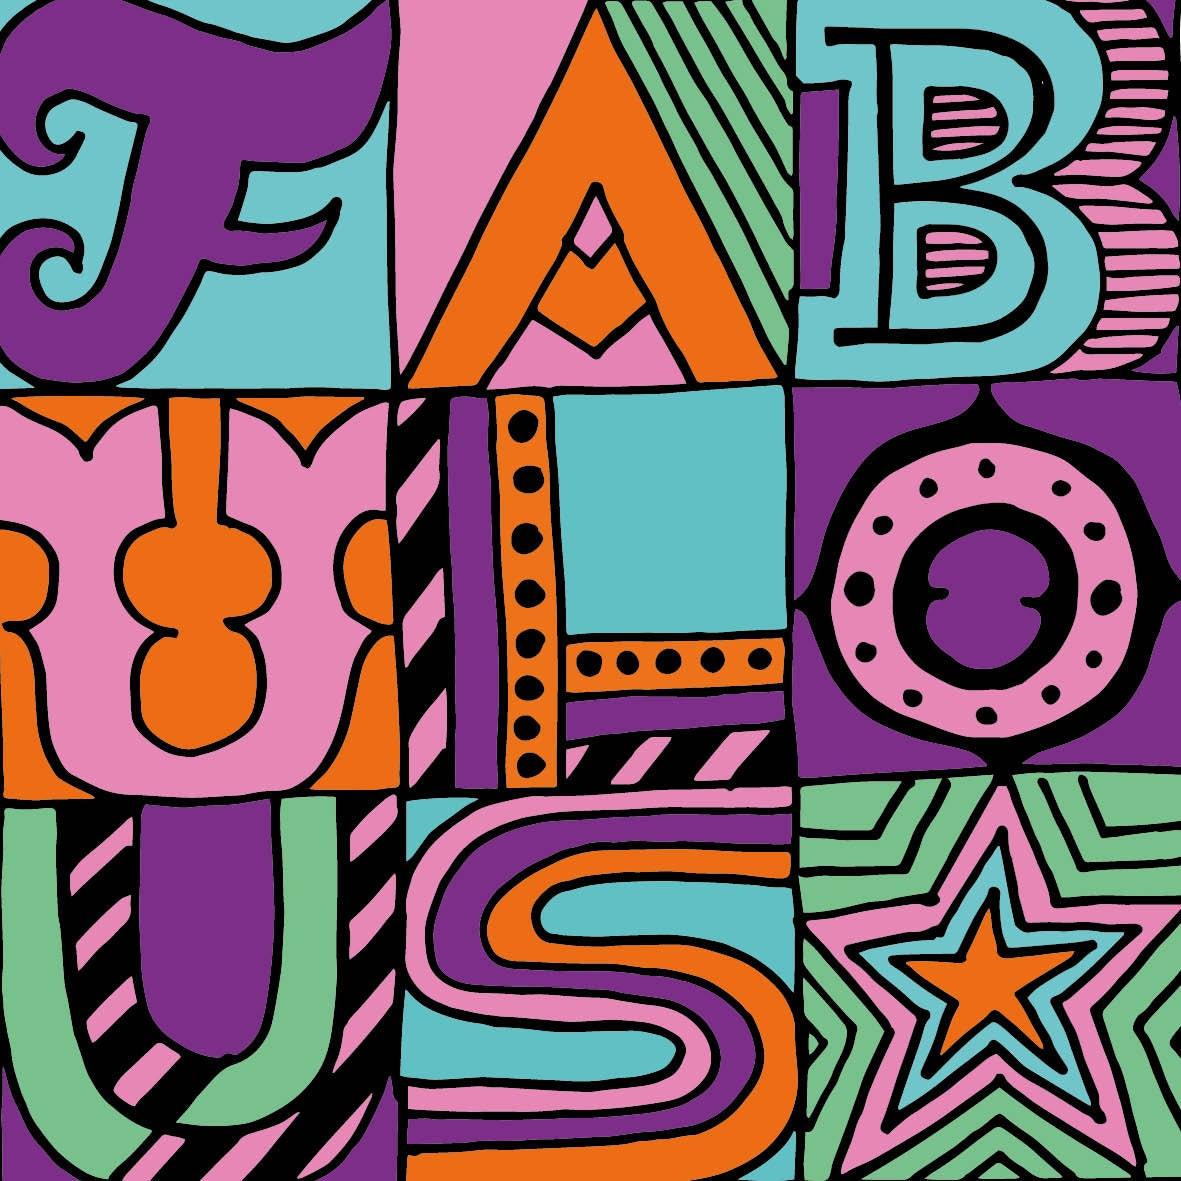 365 days of type fabulous